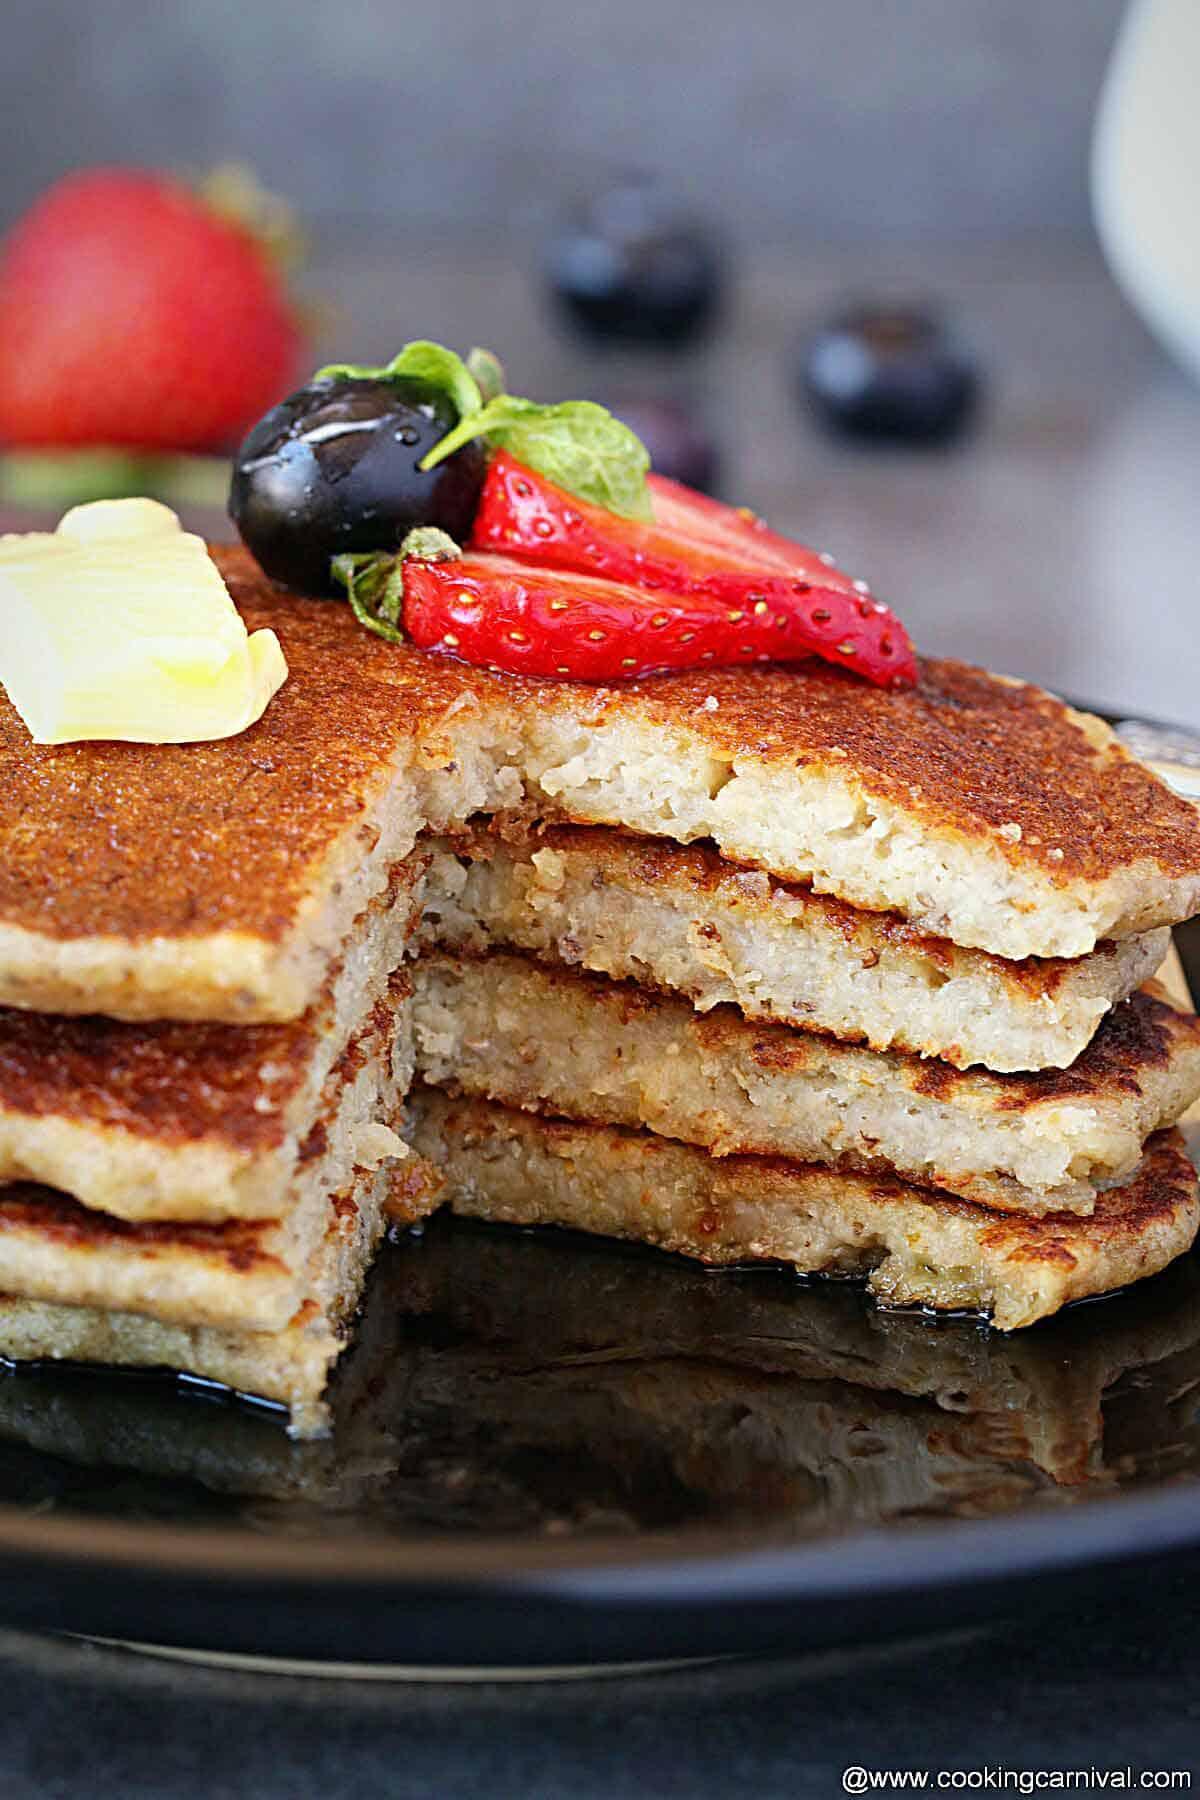 Cut picture of Banana oatmeal pancake